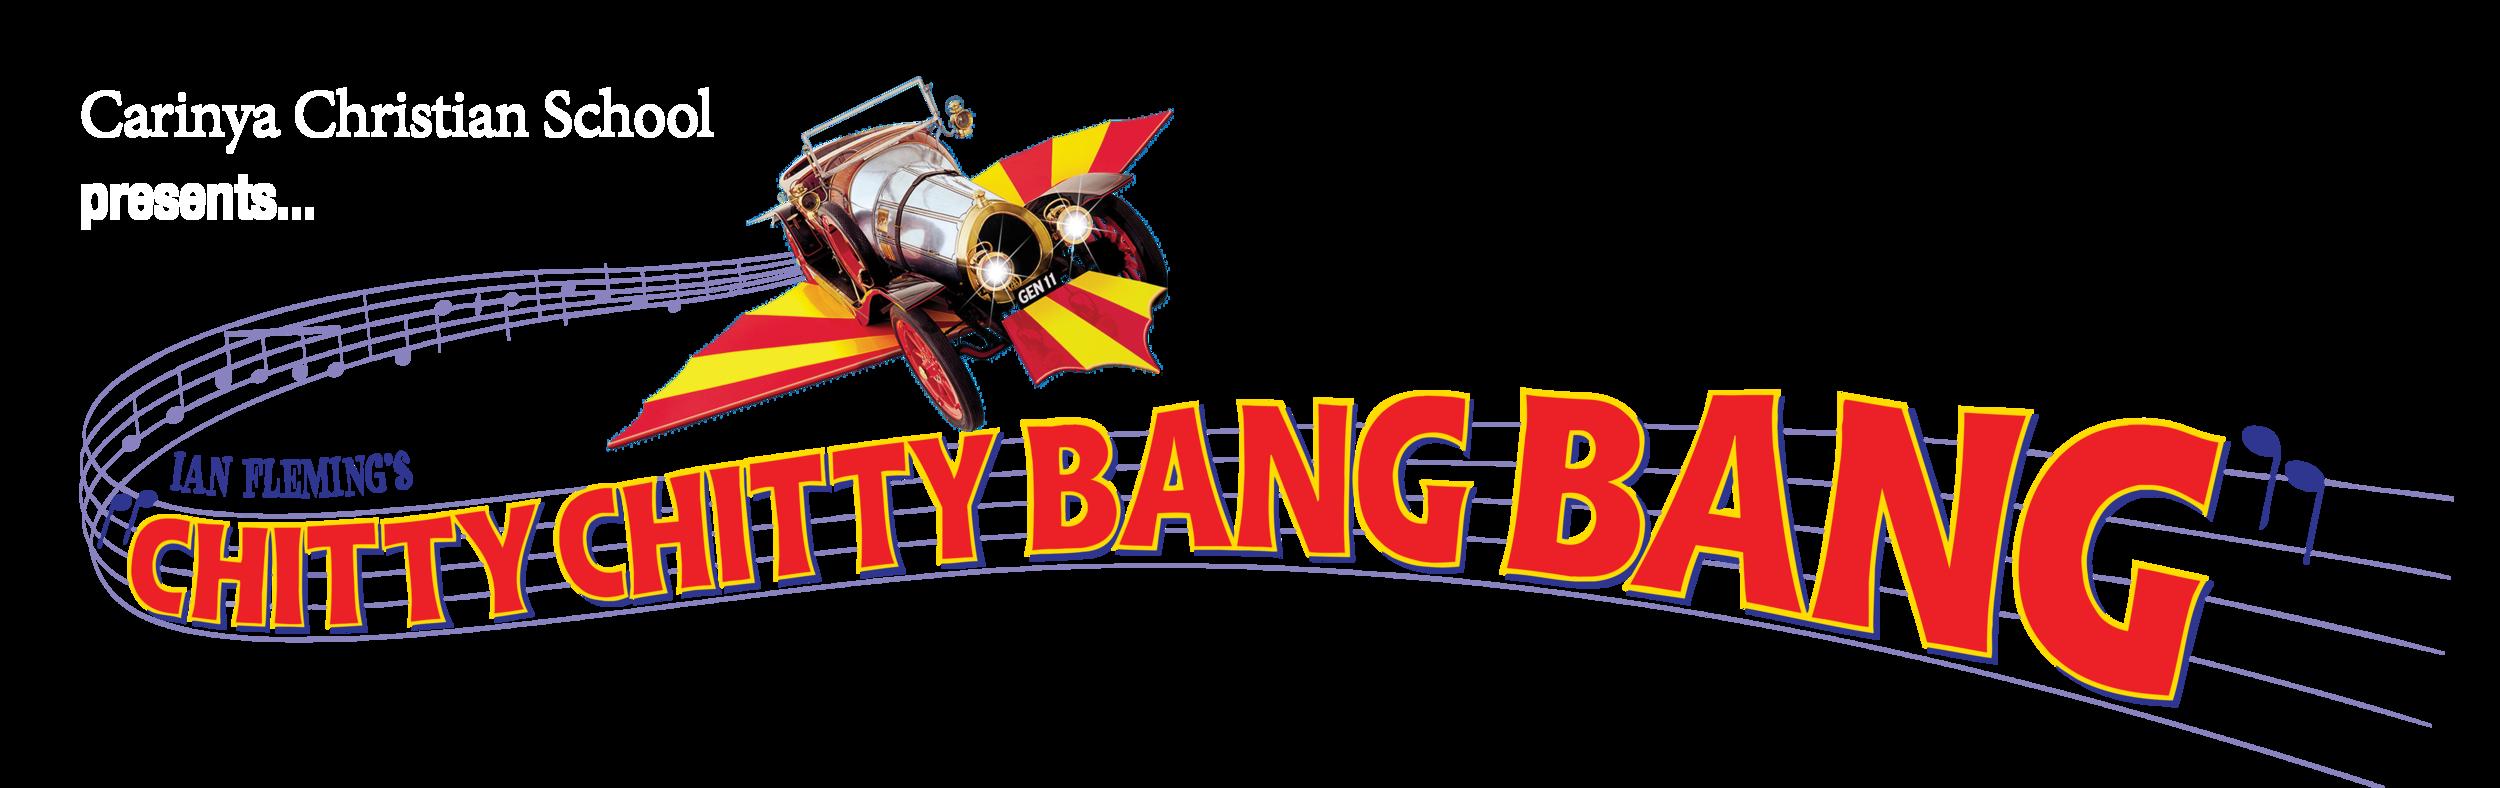 CCBB - web title.png